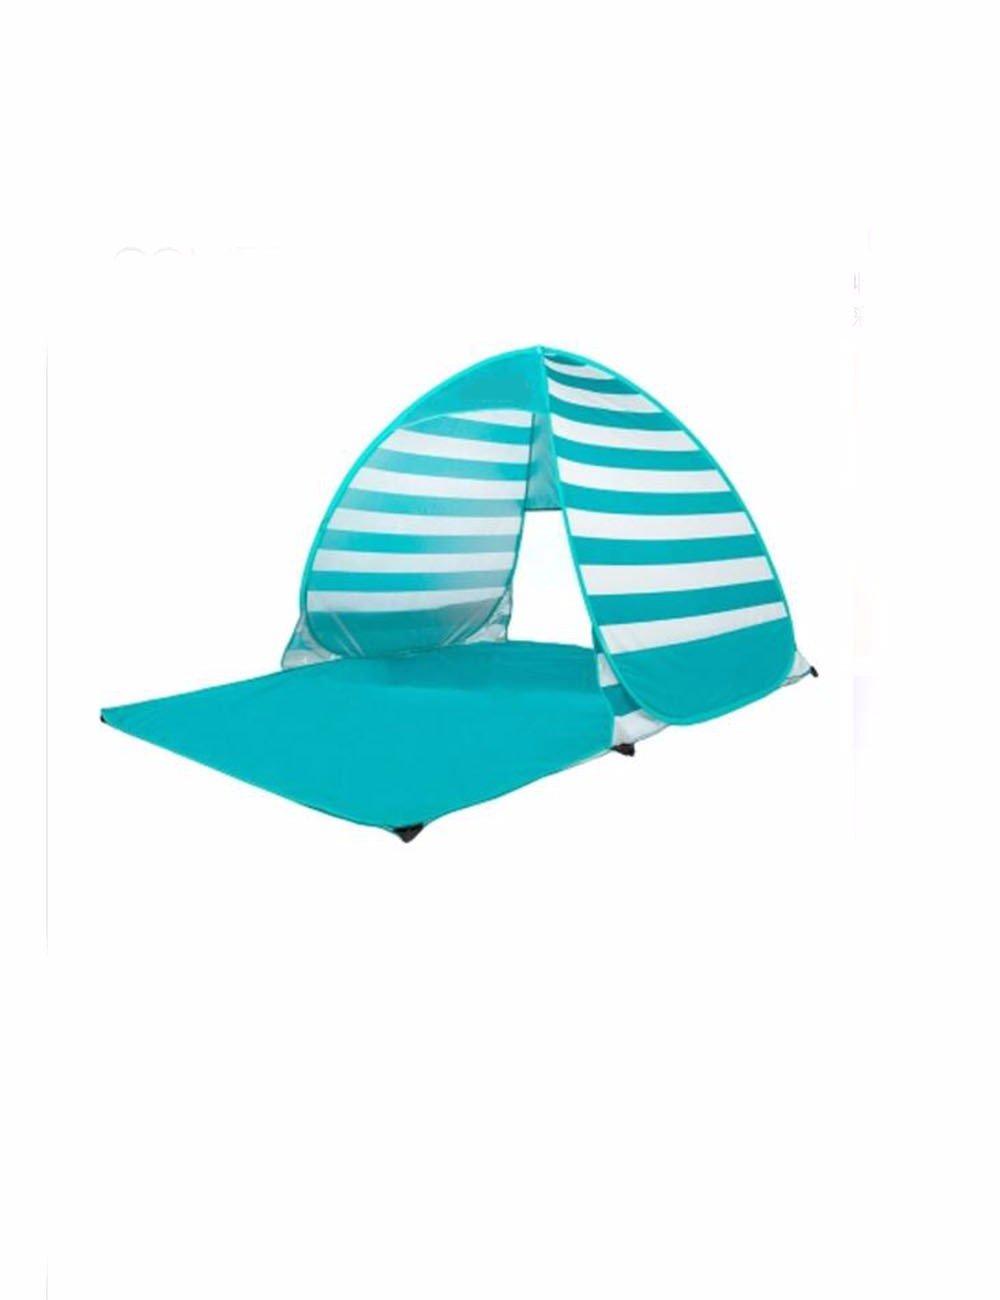 SJQKA-Zelt Outdoor 3-4 Personen Full-Automatic Portable Doppel Sunscreen Angeln Strand Zelt 2 Personen